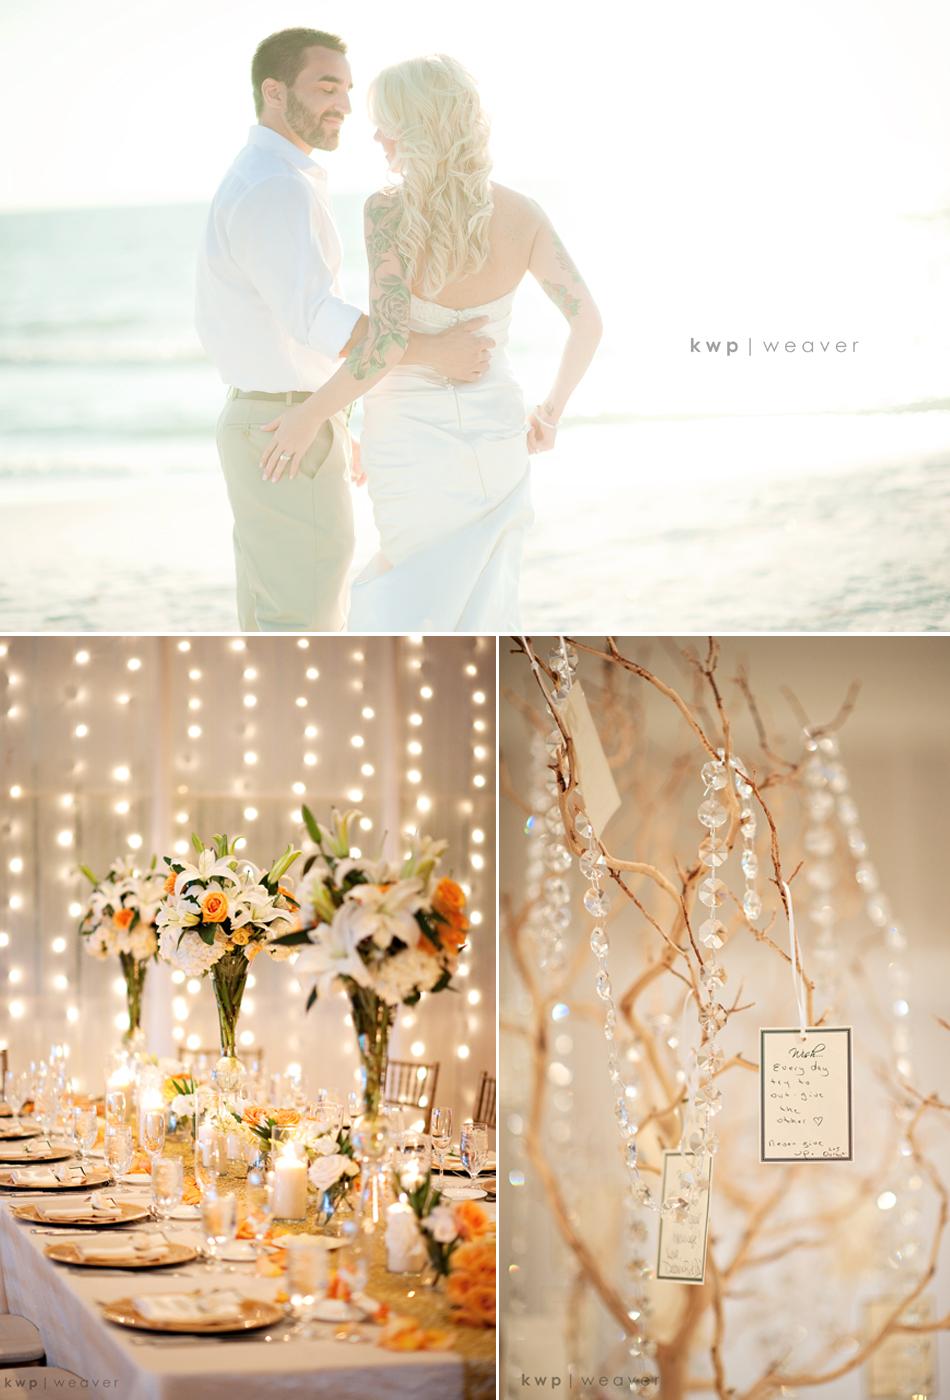 Diy Beach Wedding Centerpieces - Wedding Dress & Decore Ideas